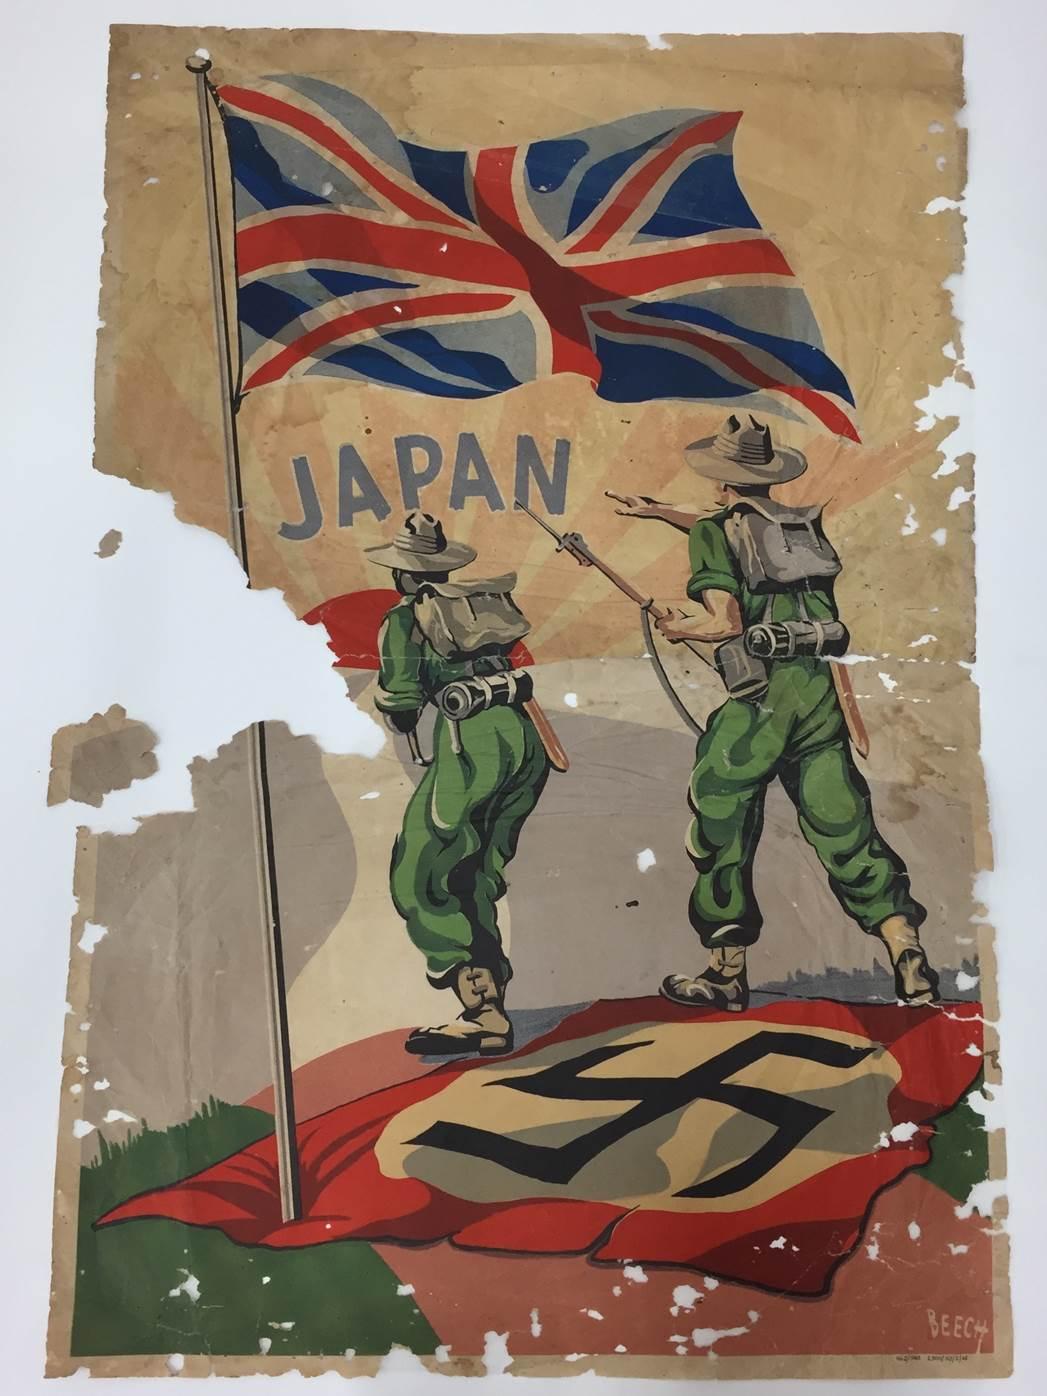 Poster of Japan after conservation